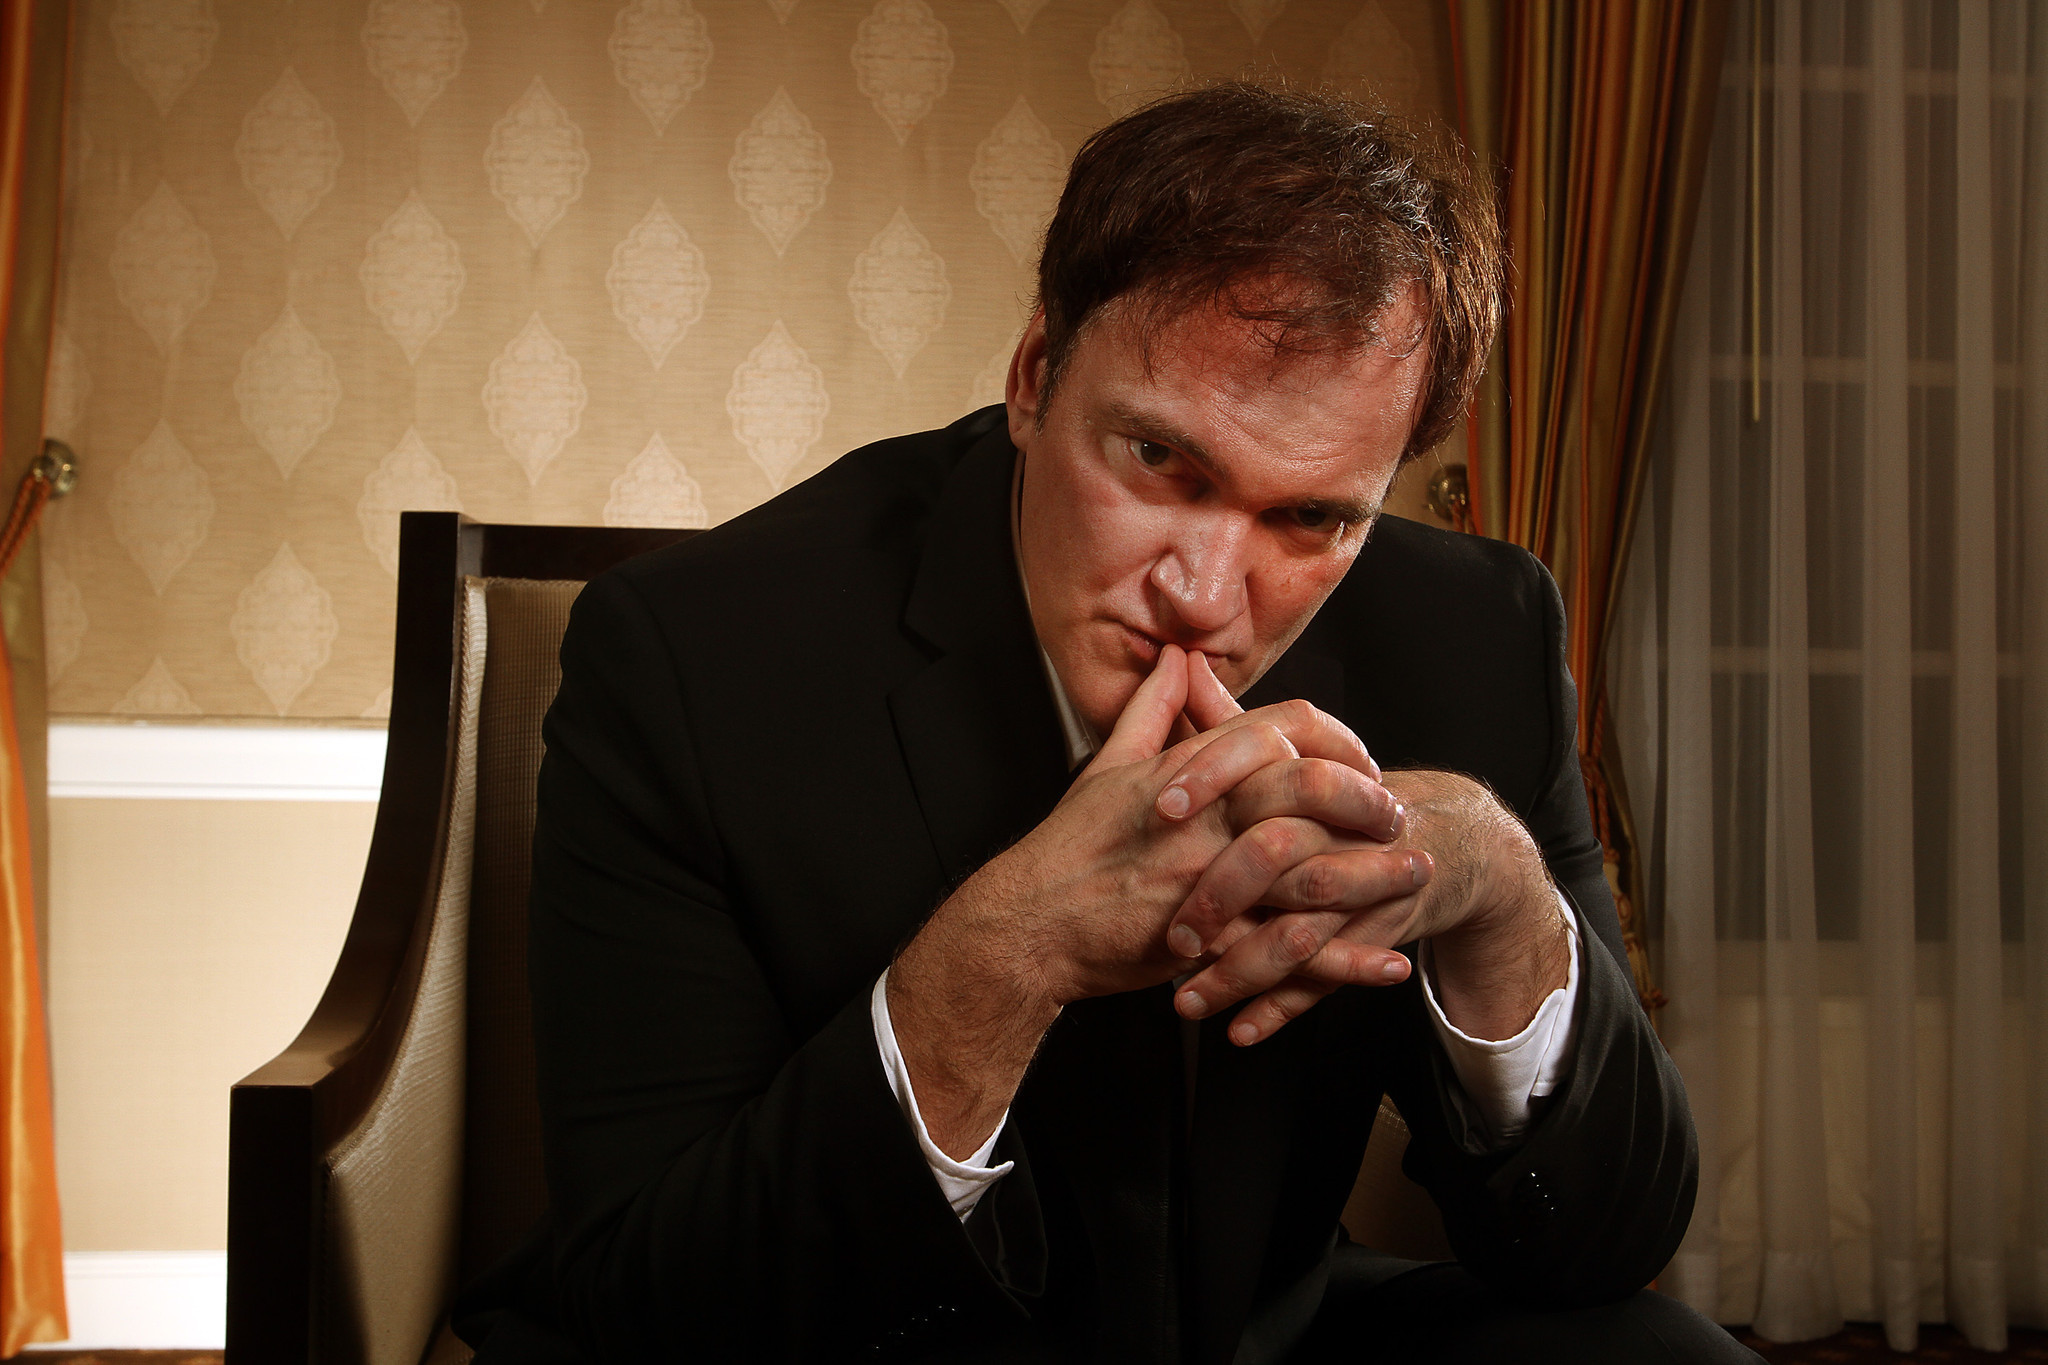 Quentin Tarantino Director View Wallpaper Hd Man 4k